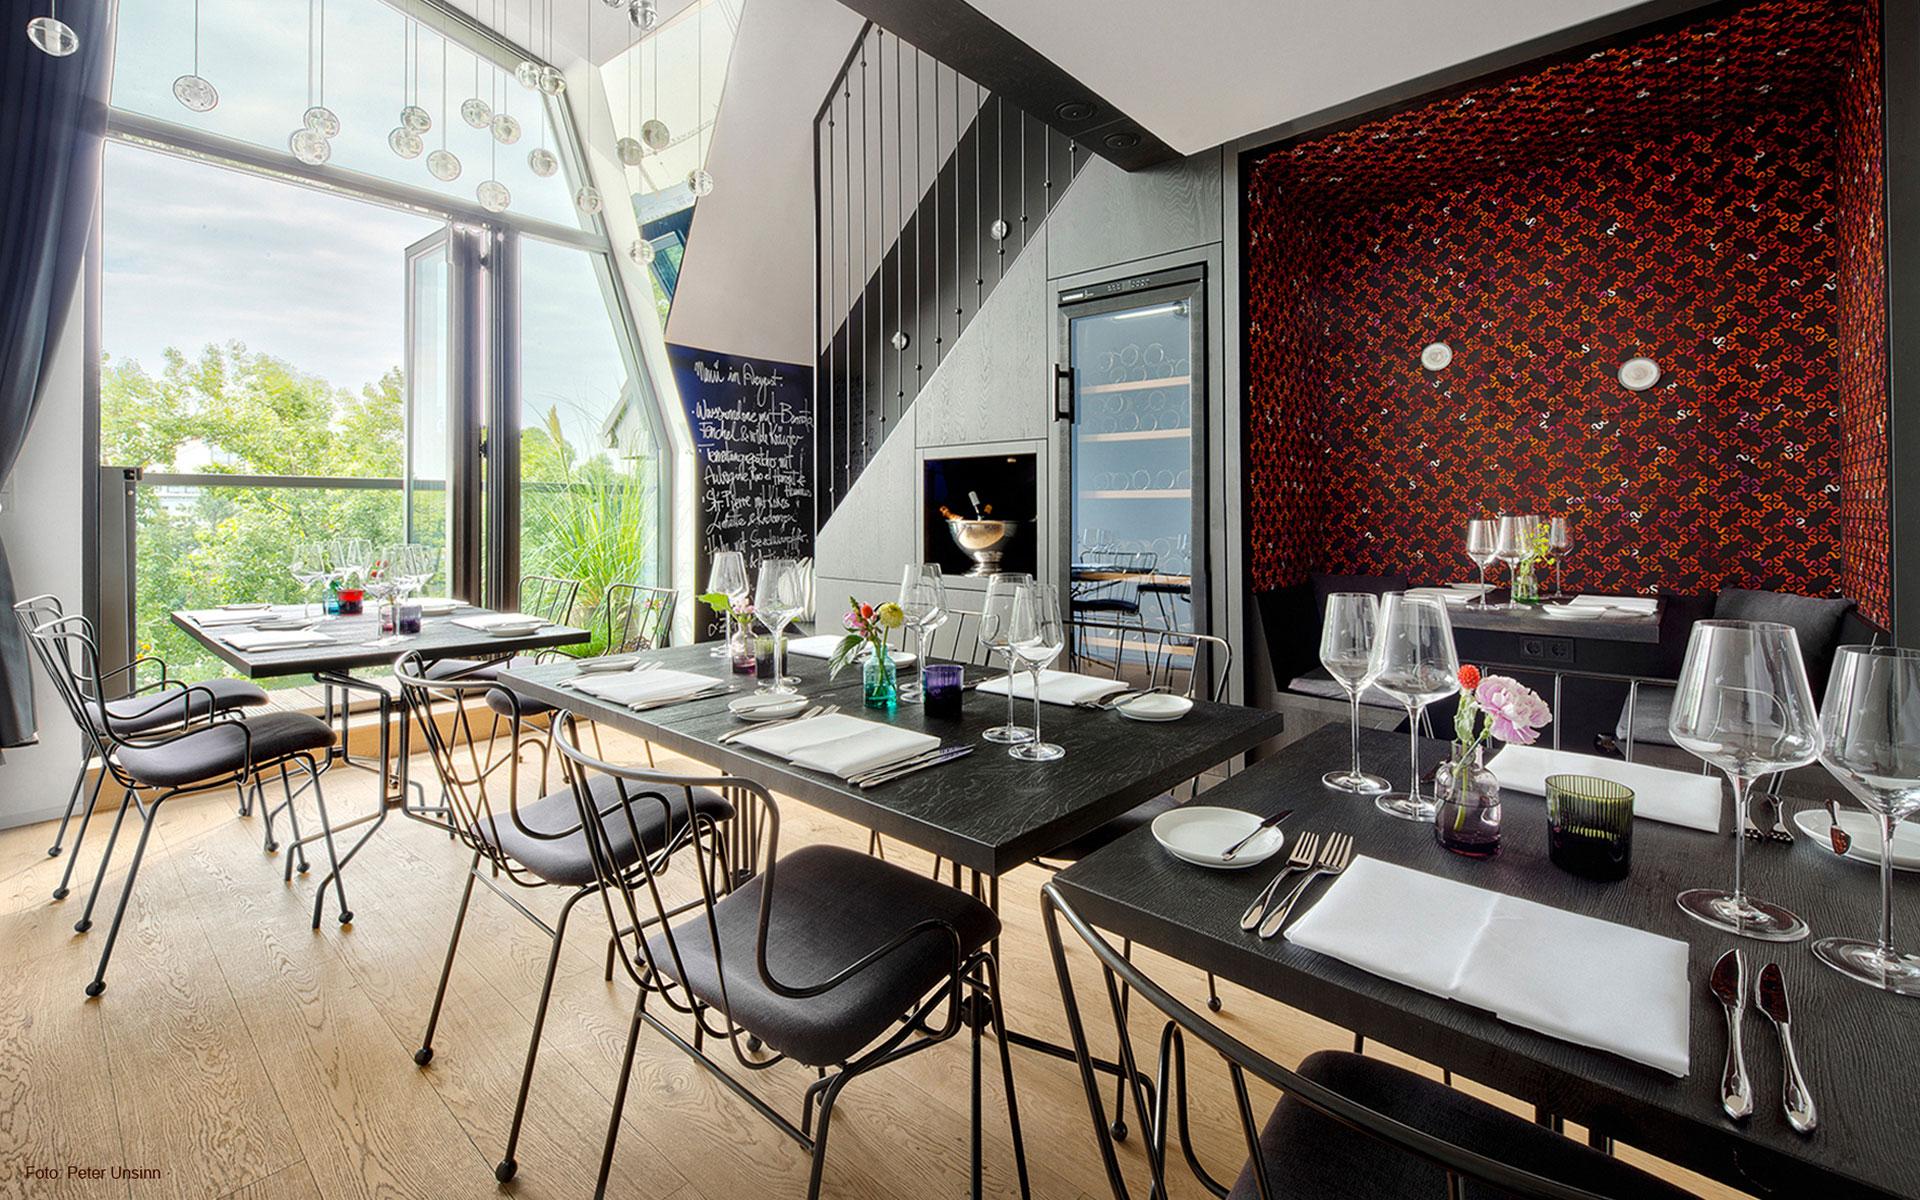 innenarchitektur sachsen barbara mario graupner atelier n4. Black Bedroom Furniture Sets. Home Design Ideas